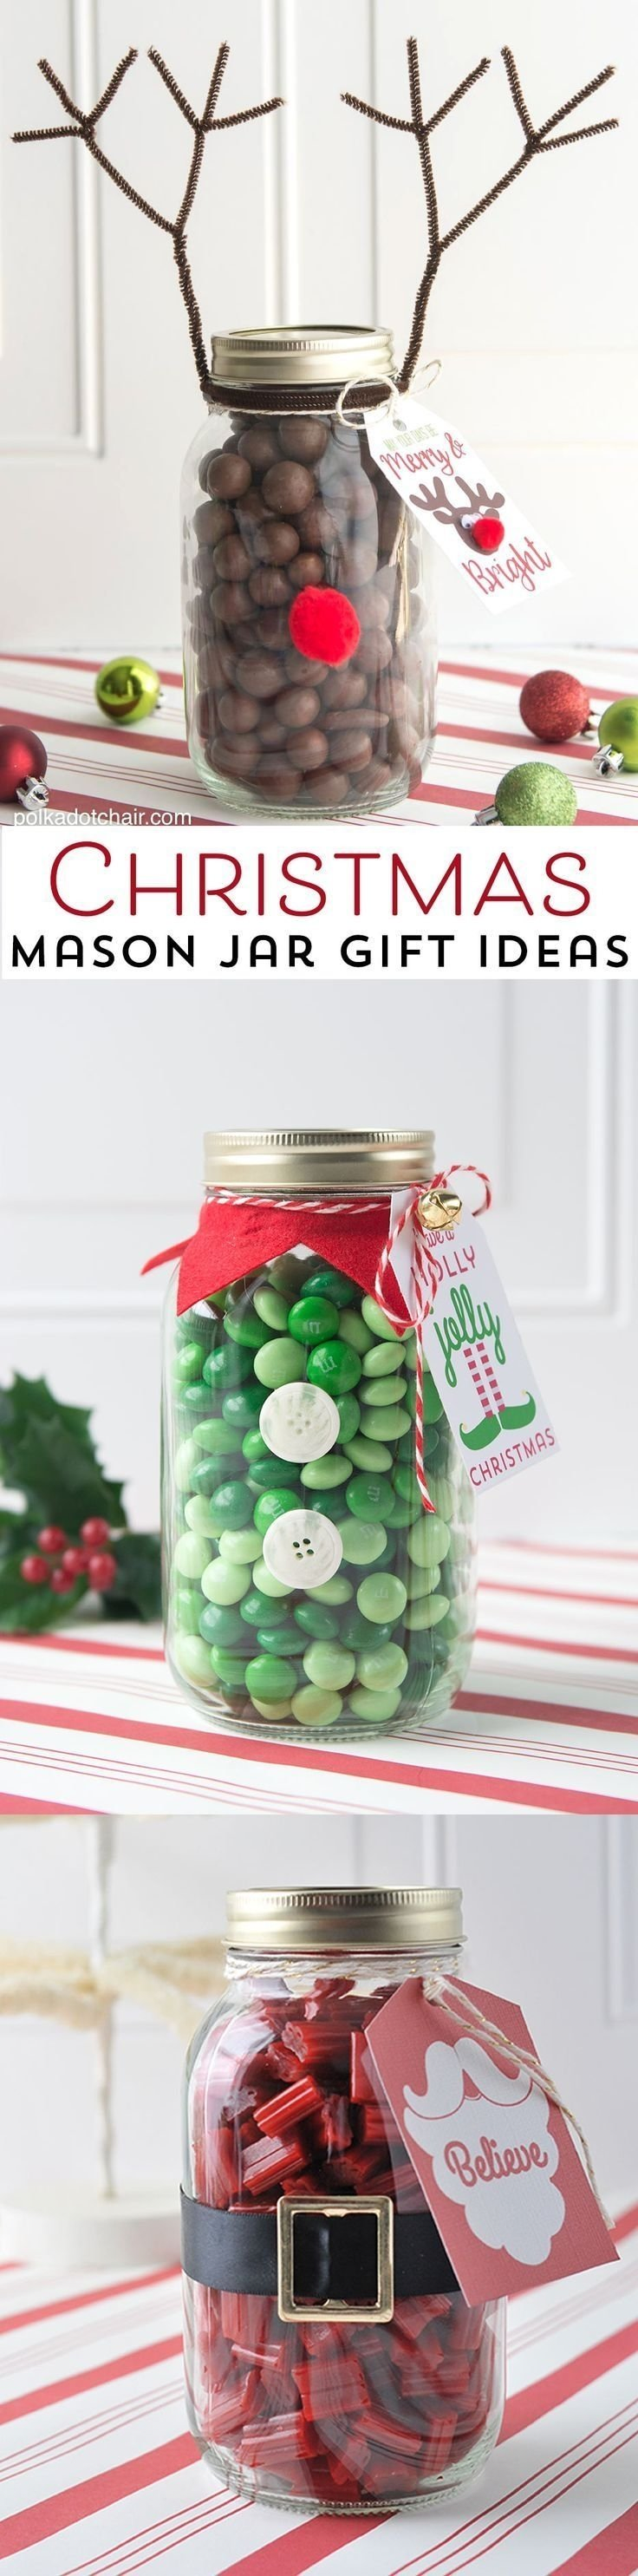 reindeer christmas mason jar gift idea | mason jar christmas gifts